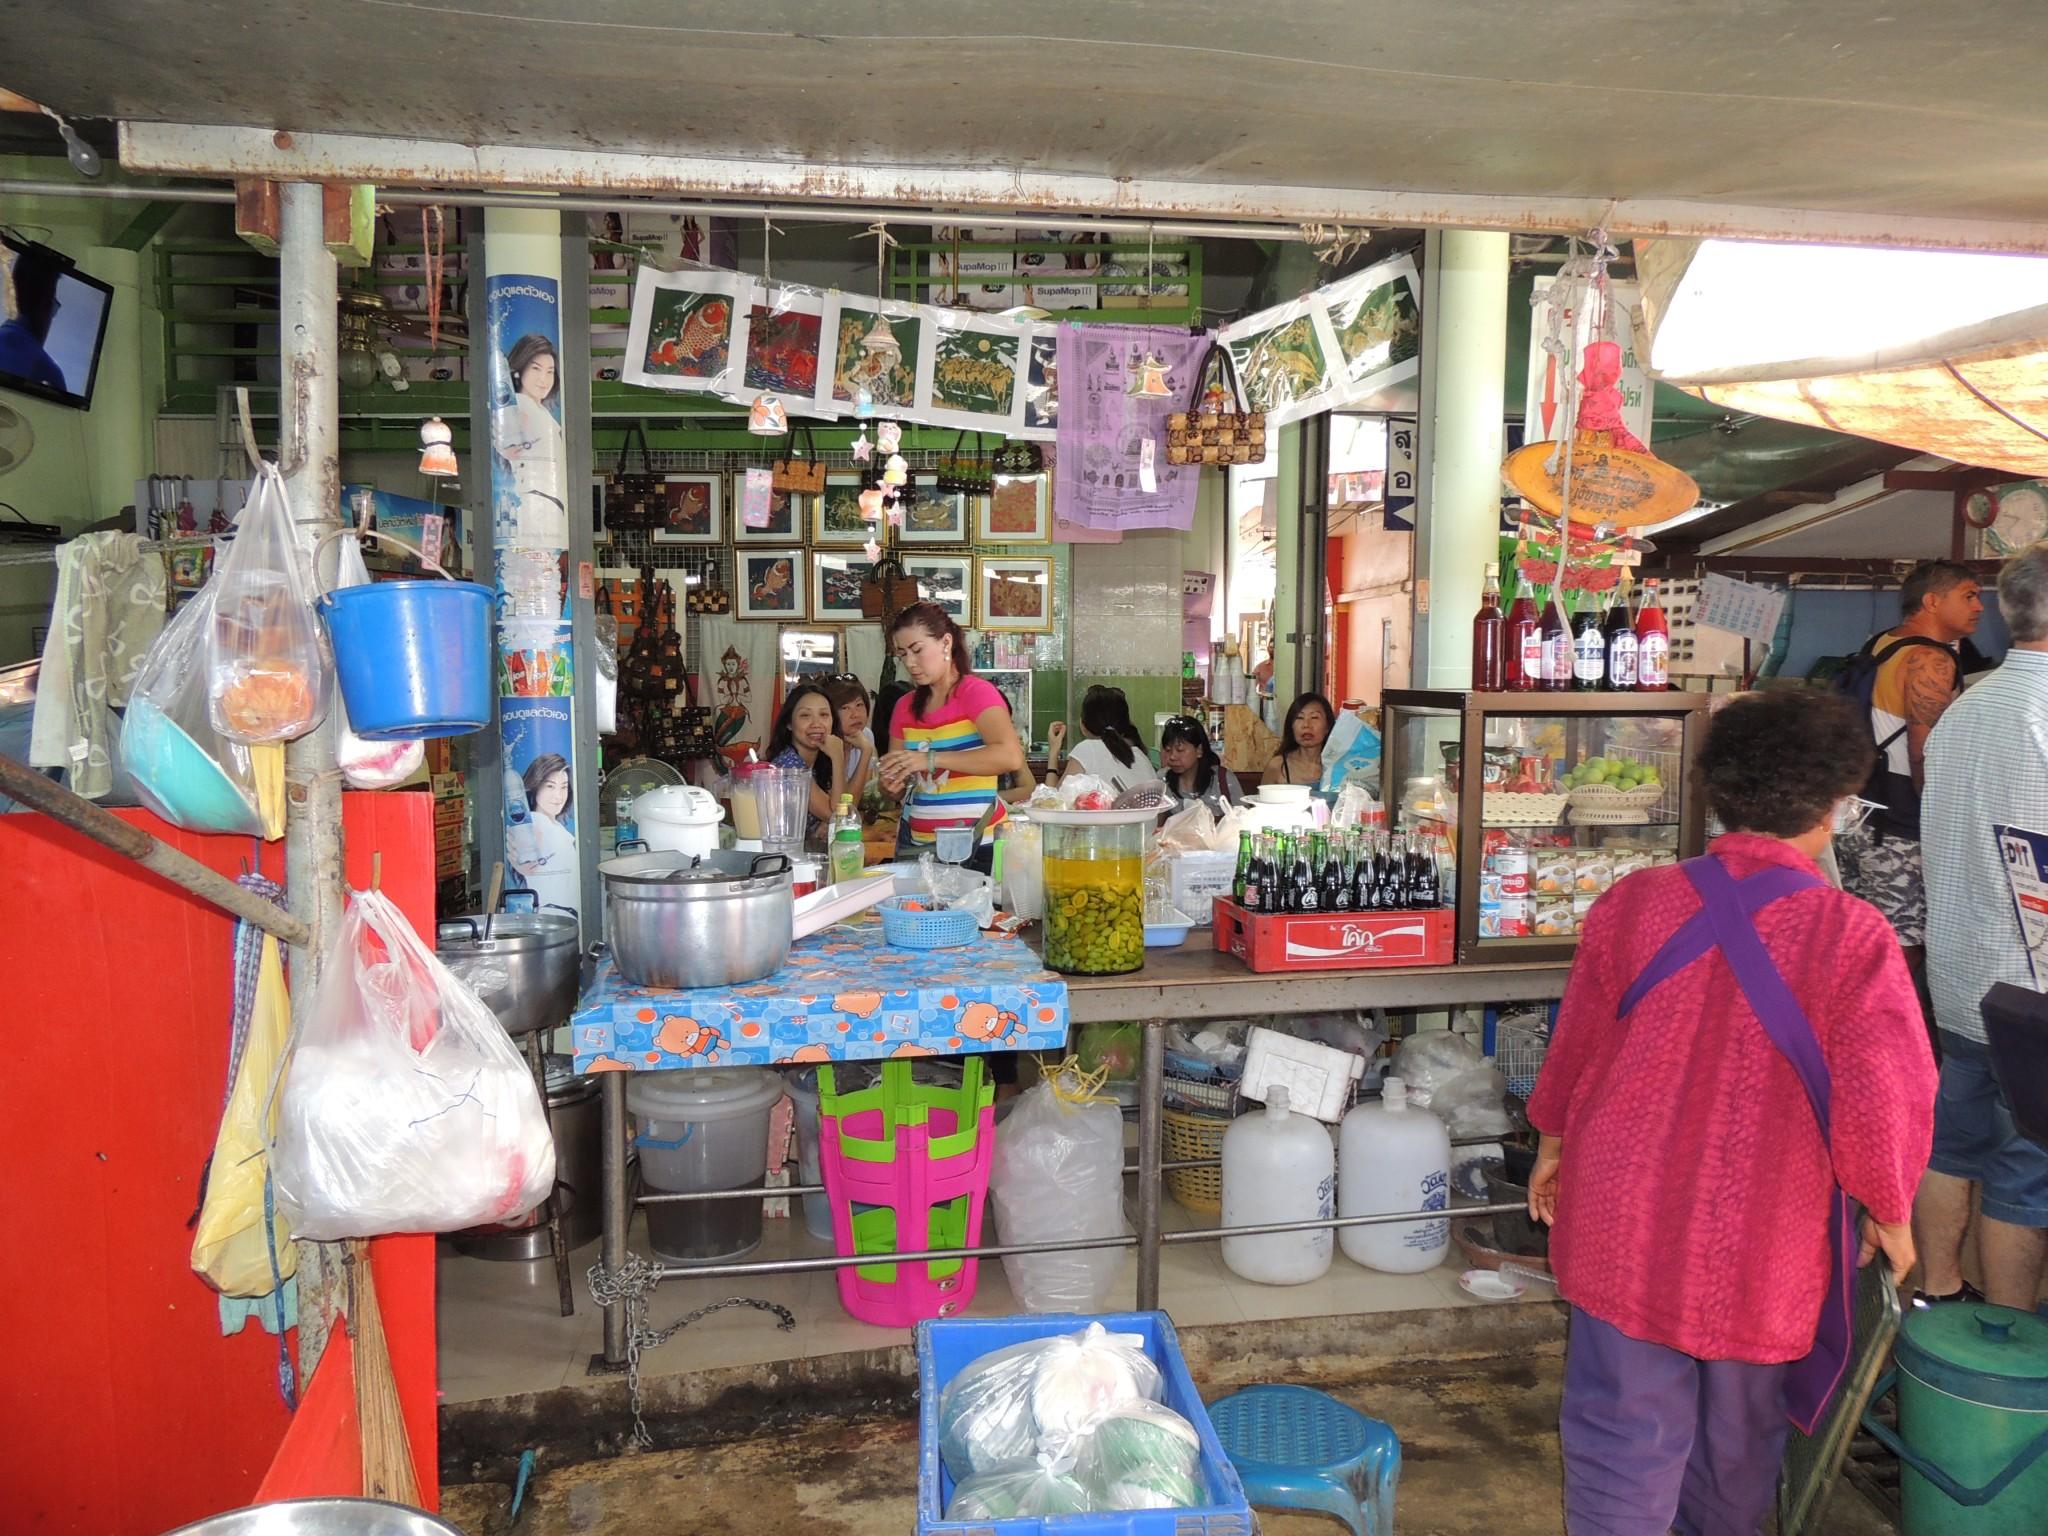 Thailand, de beroemde Maeklong markt